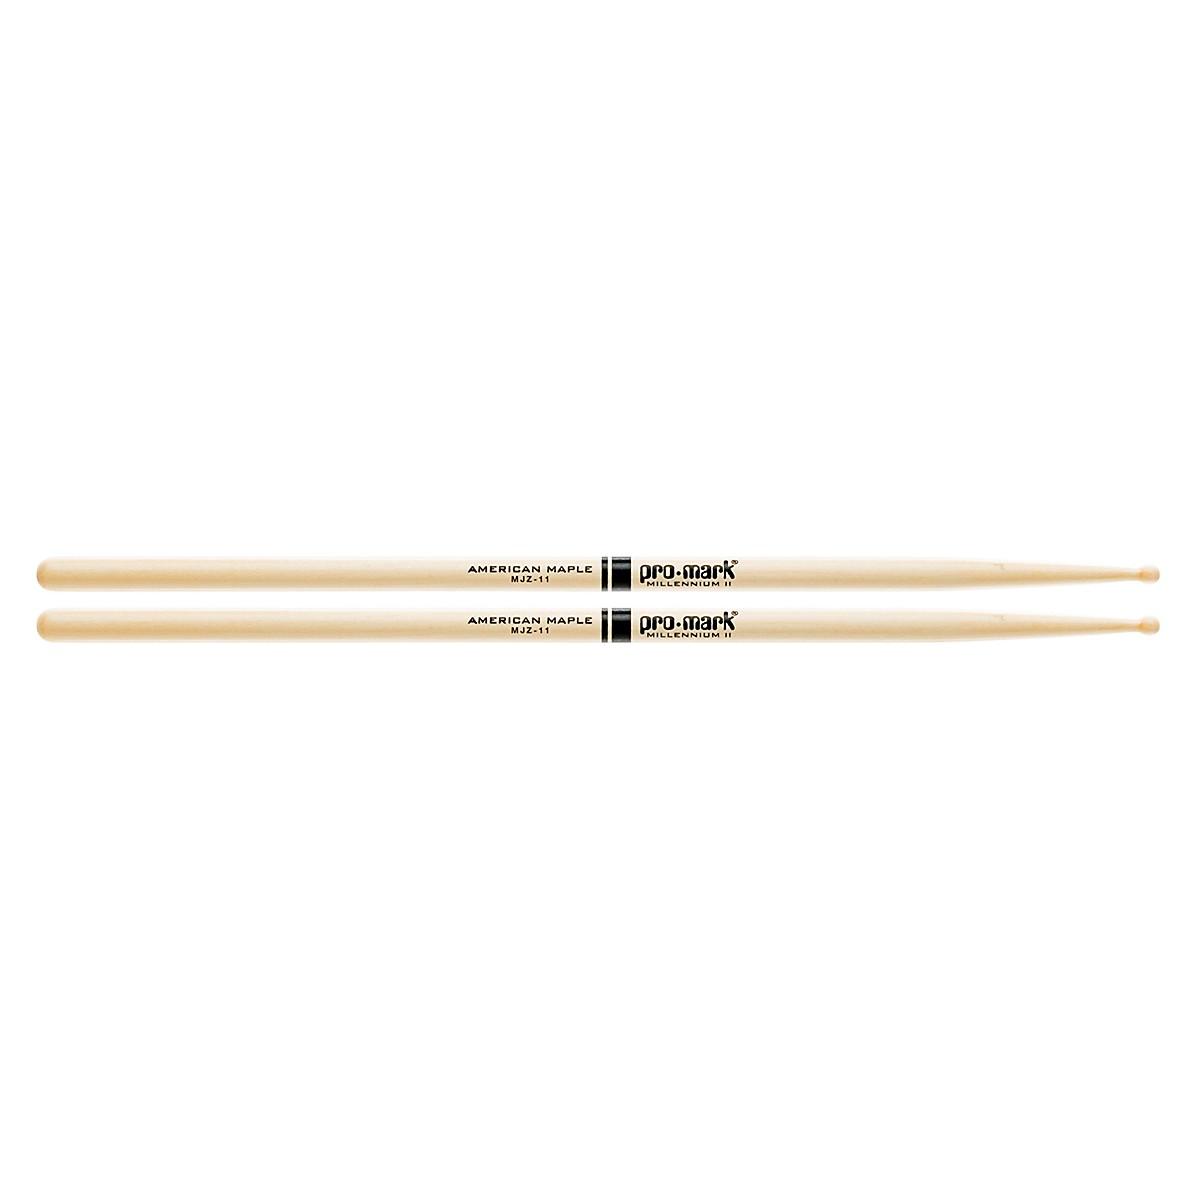 Promark Maple Jazz Cafe Drumsticks